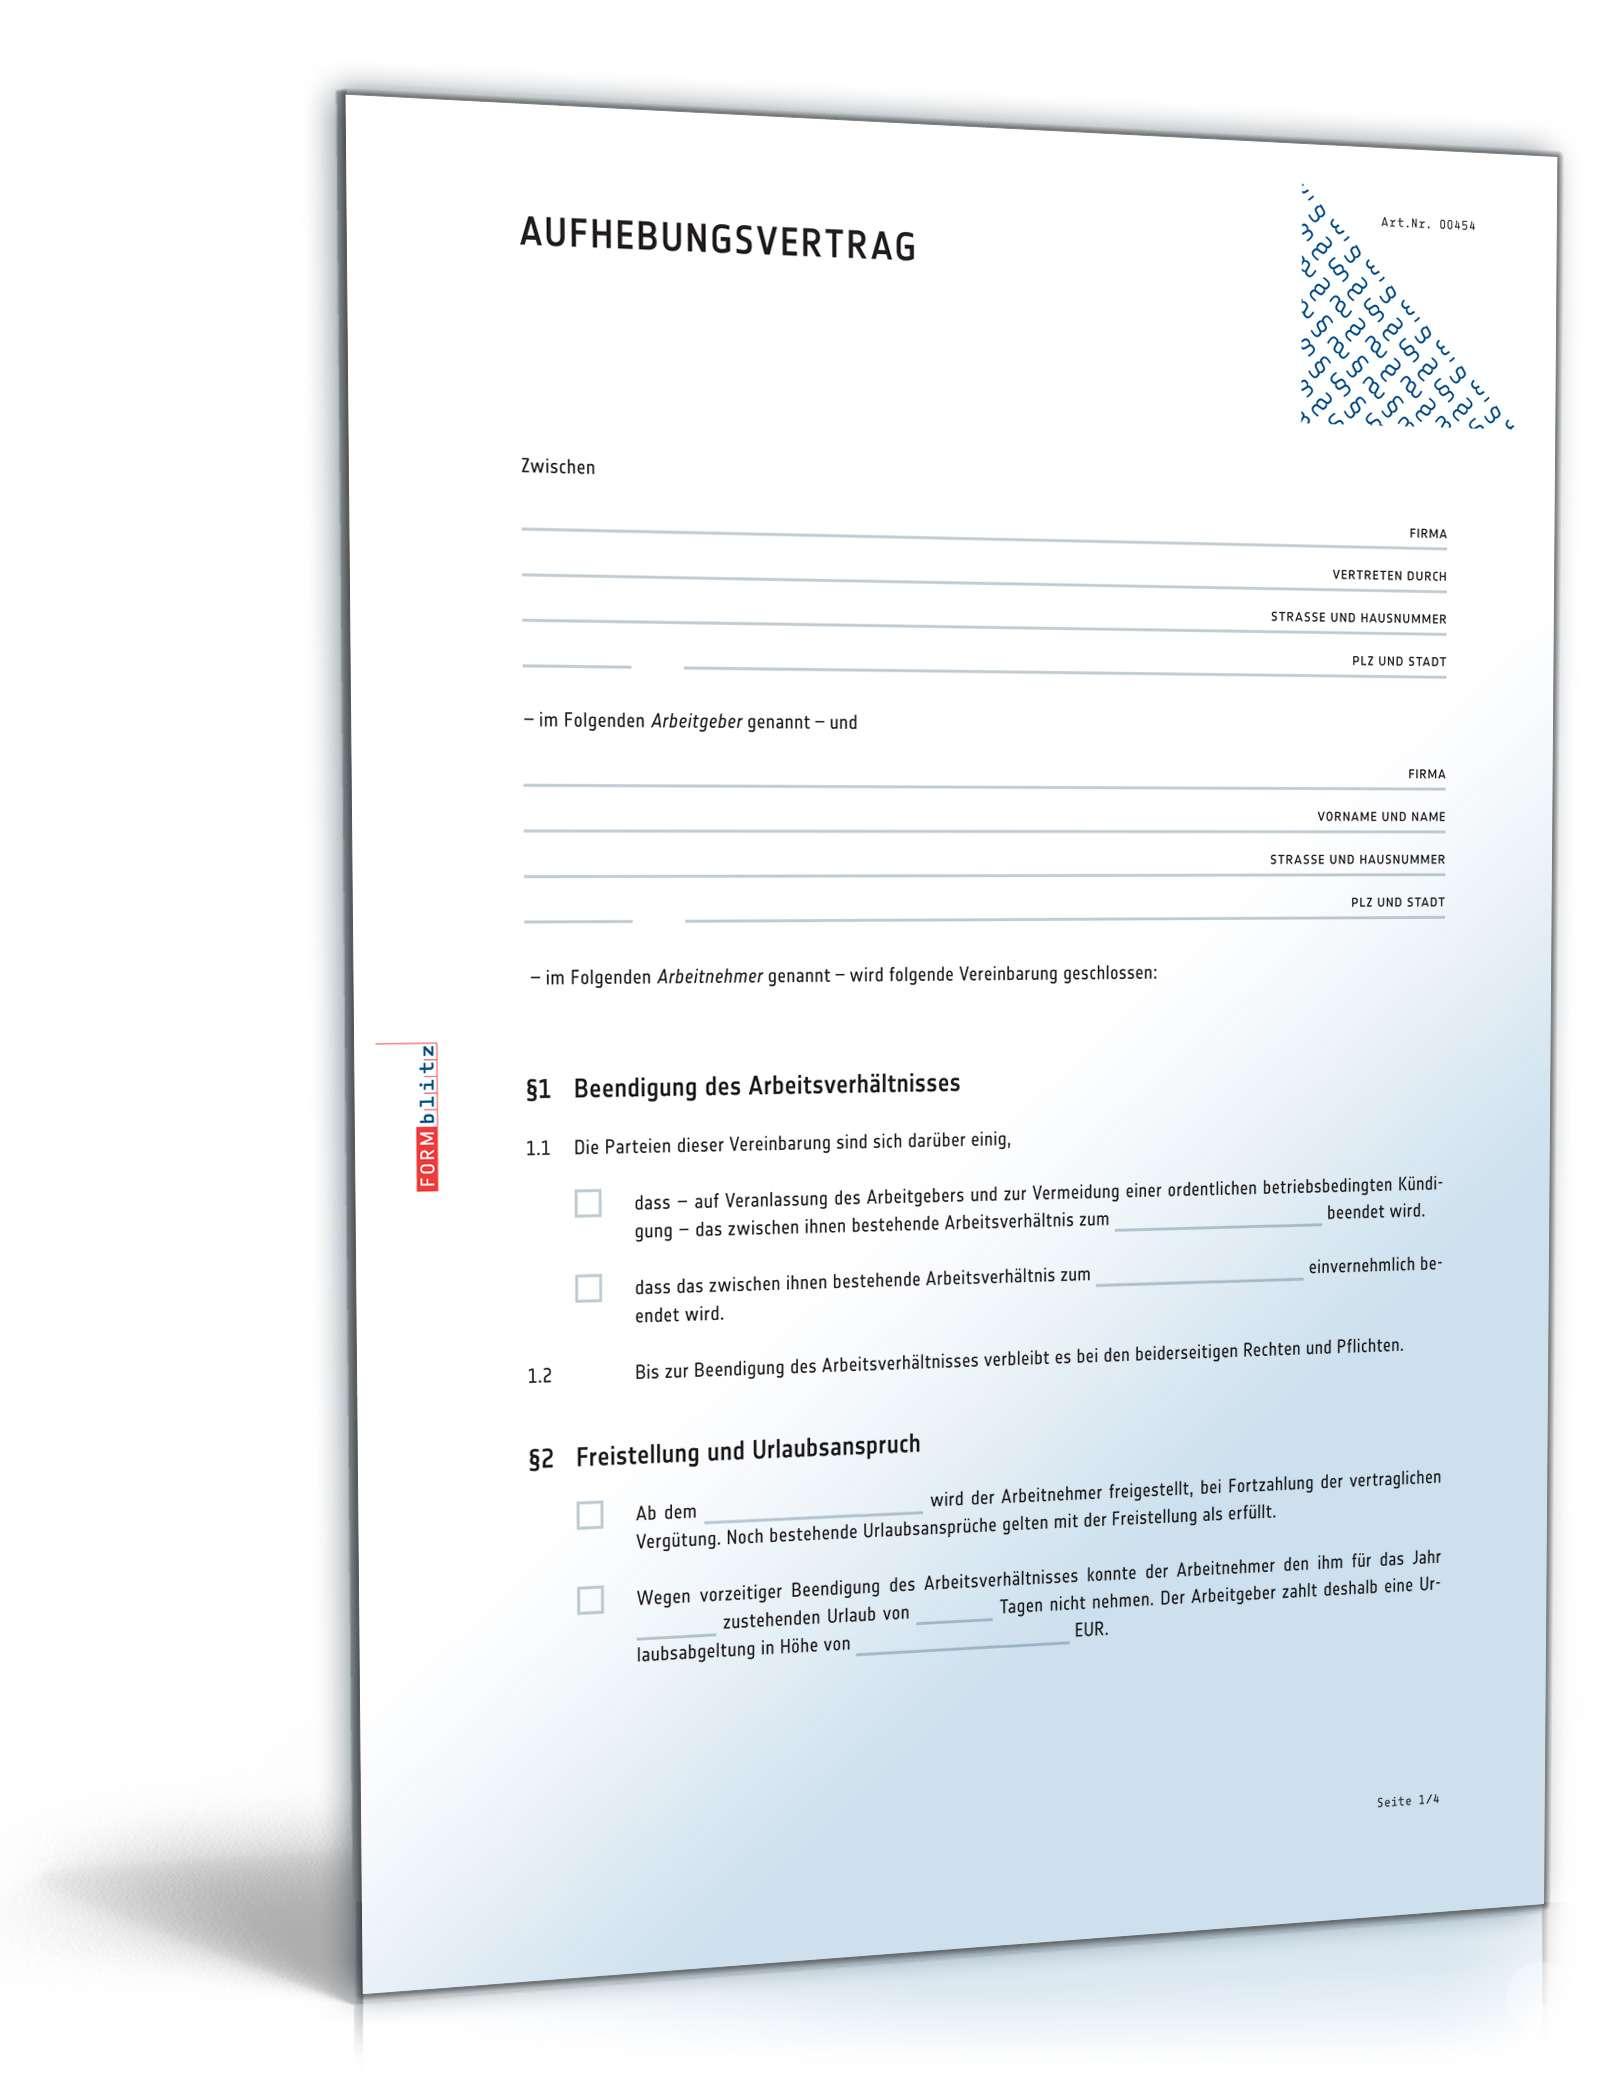 aufhebungsvertrag arbeitsverhltnis - Kundigung Aufhebungsvertrag Muster